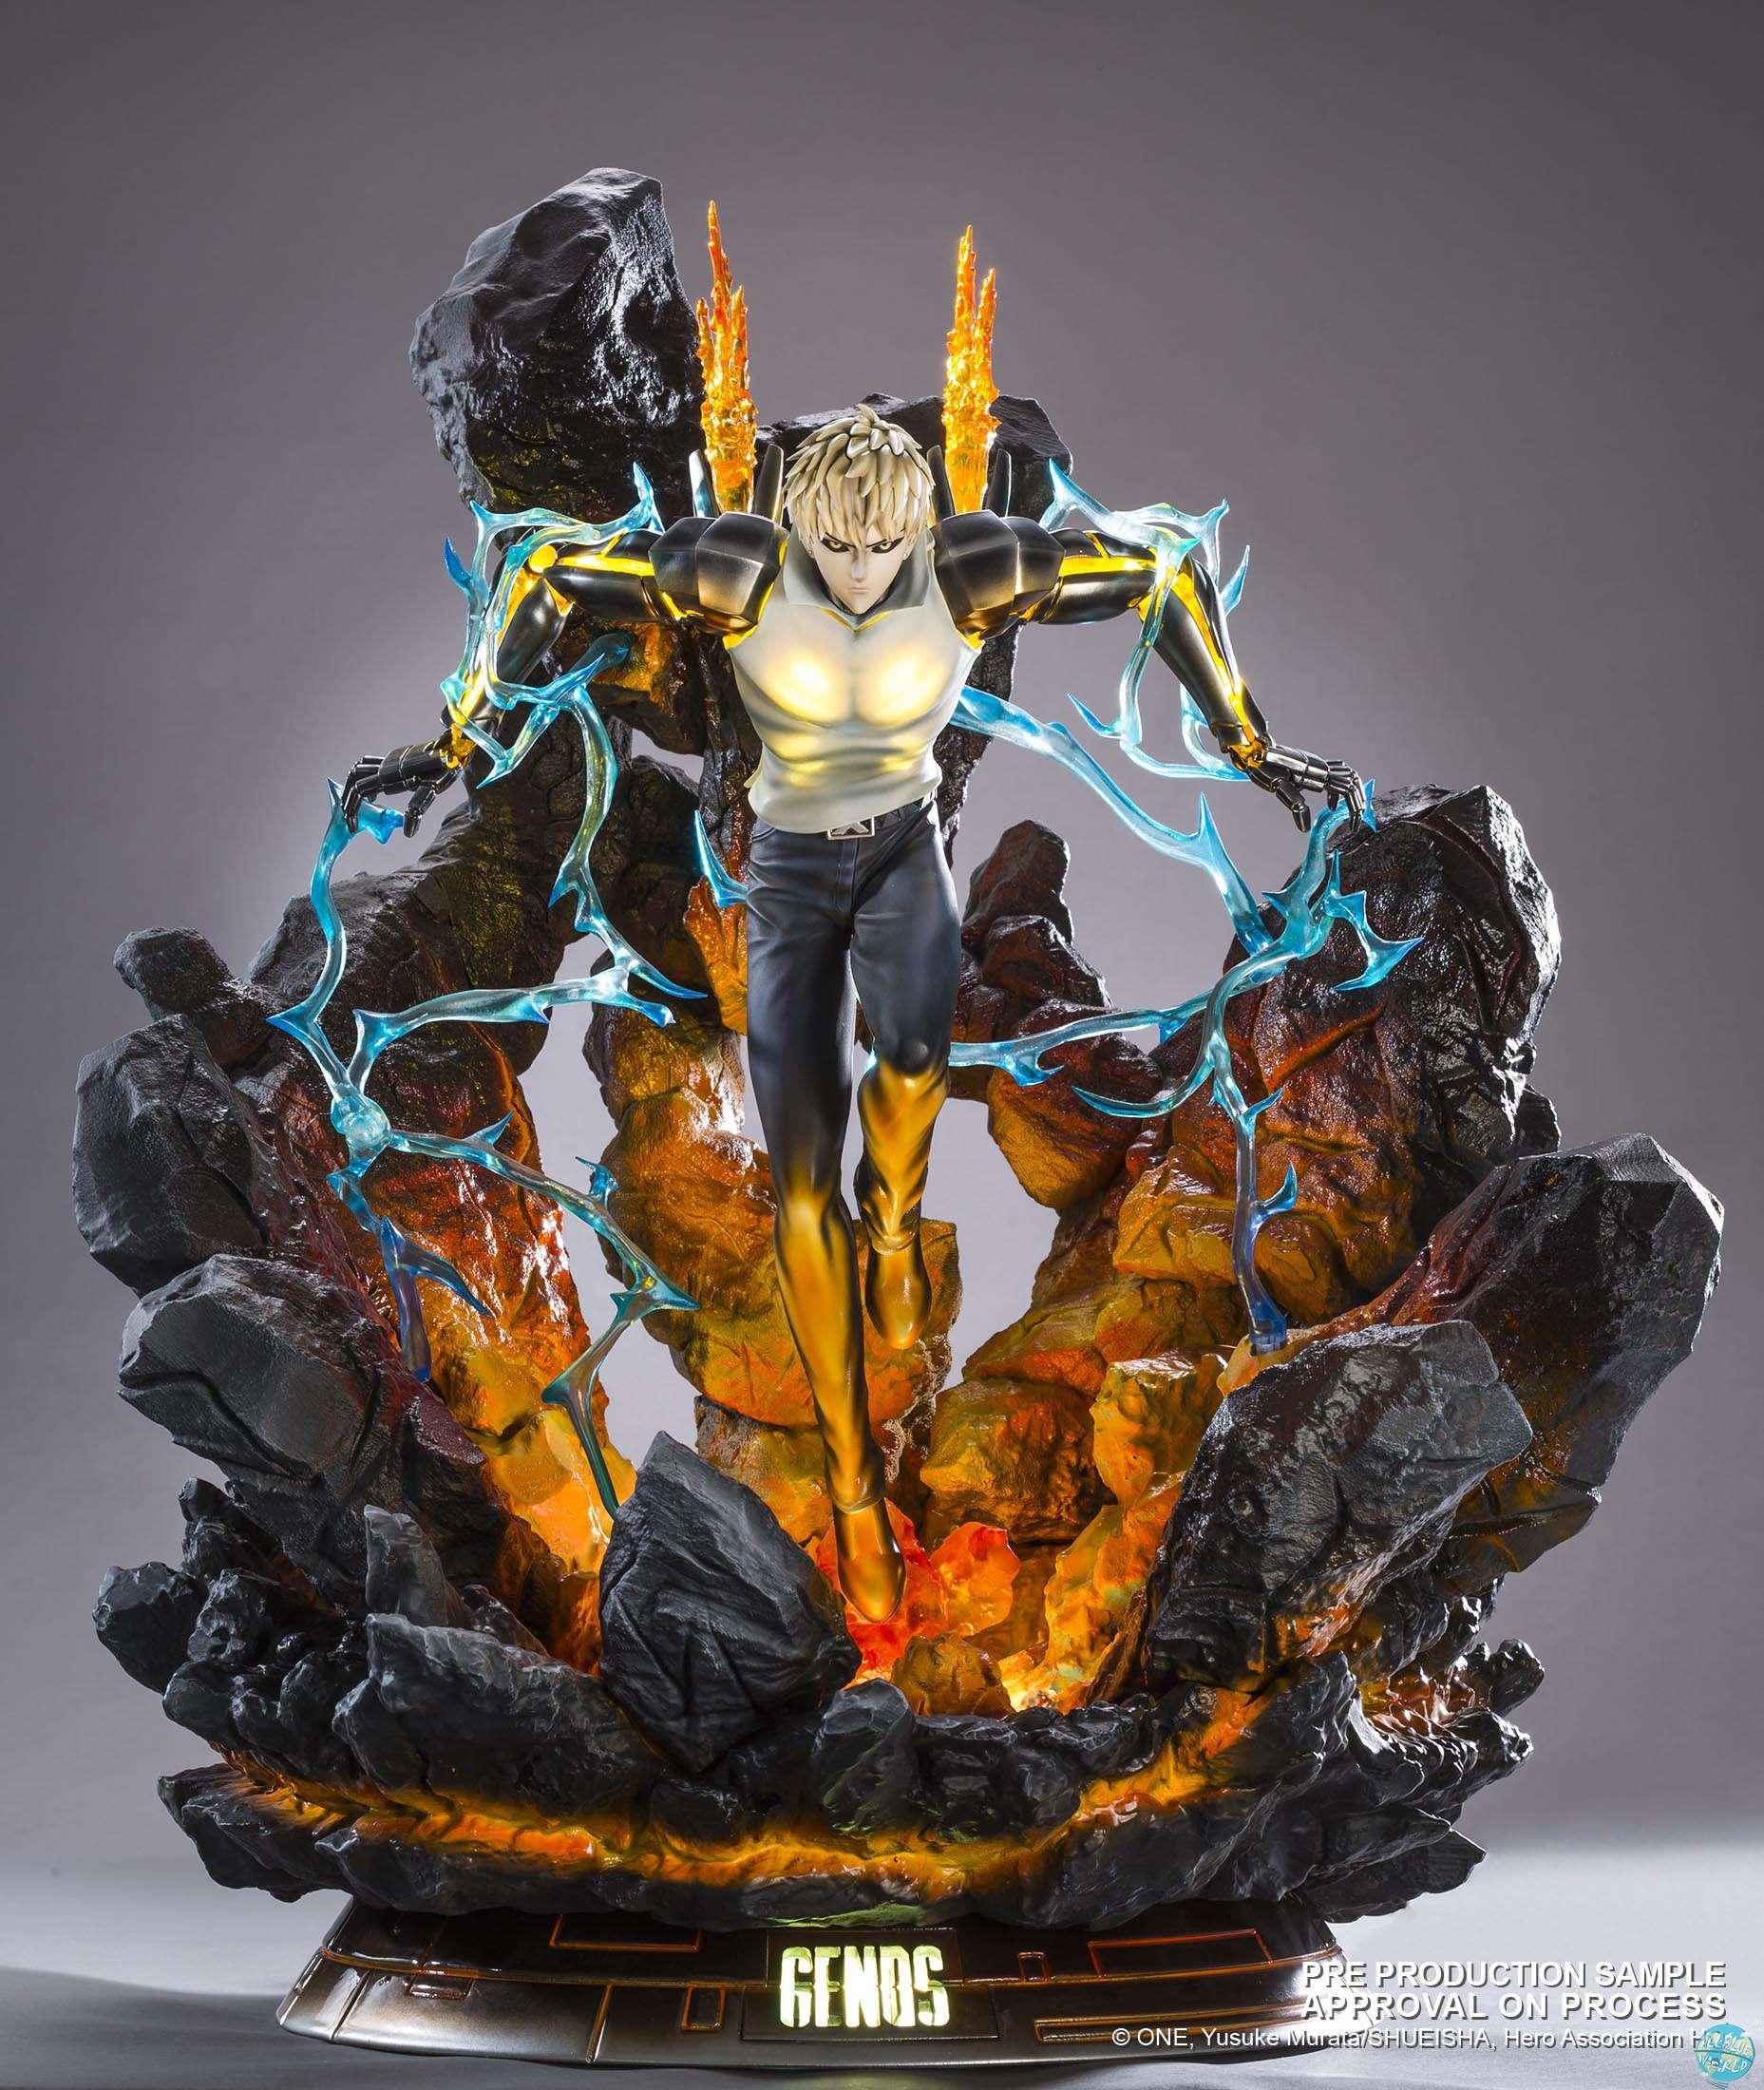 One Punch Man Genos Statue Allblue World Anime Figuren Tsume Art Madara Uchiha Shop Jetzt Hier Online Bestellen